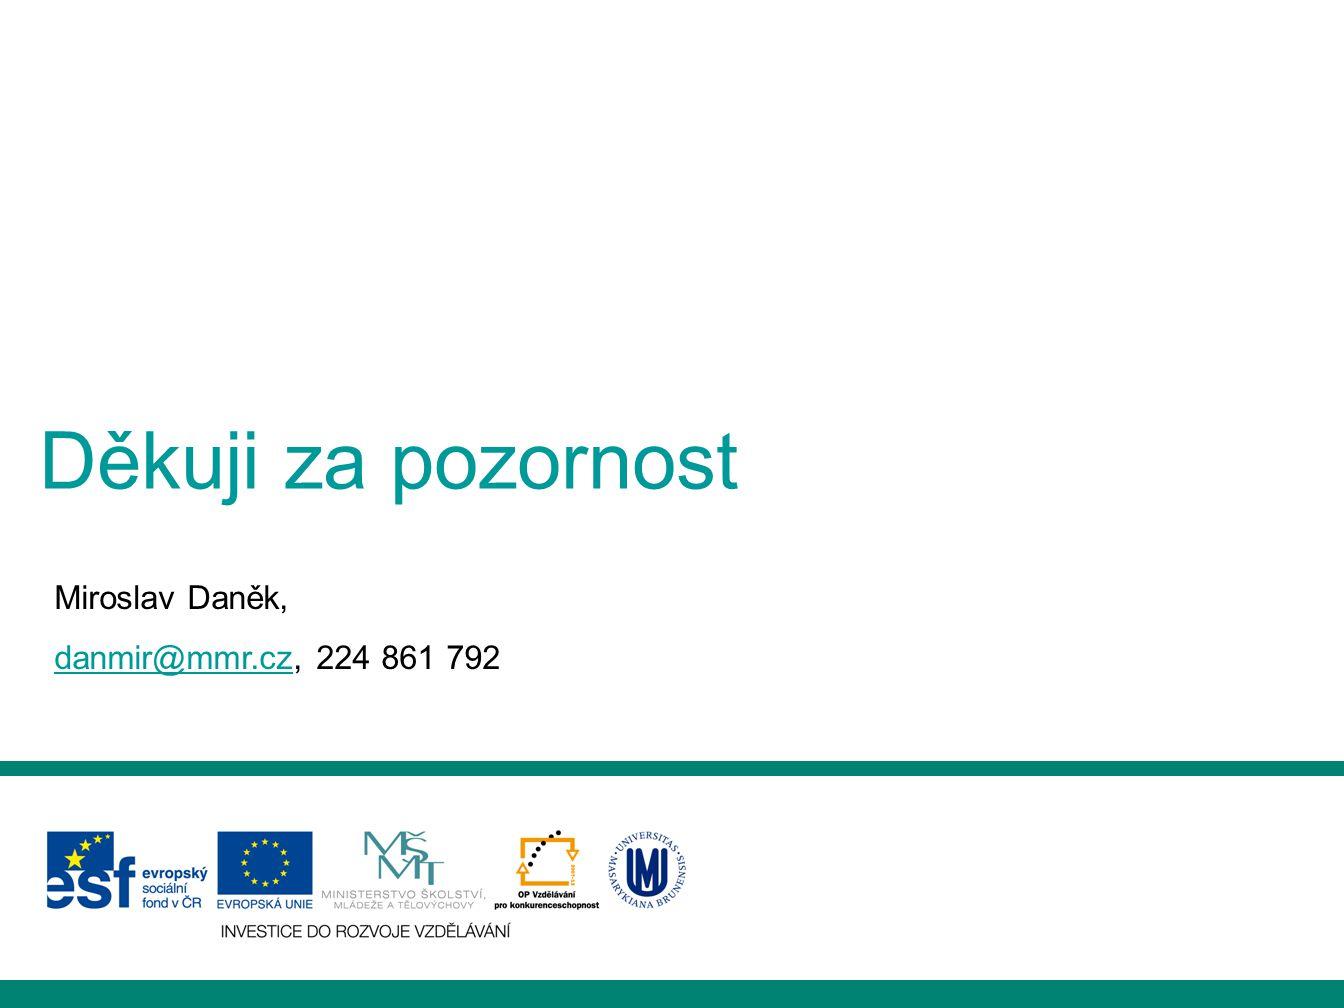 Děkuji za pozornost Miroslav Daněk, danmir@mmr.czdanmir@mmr.cz, 224 861 792